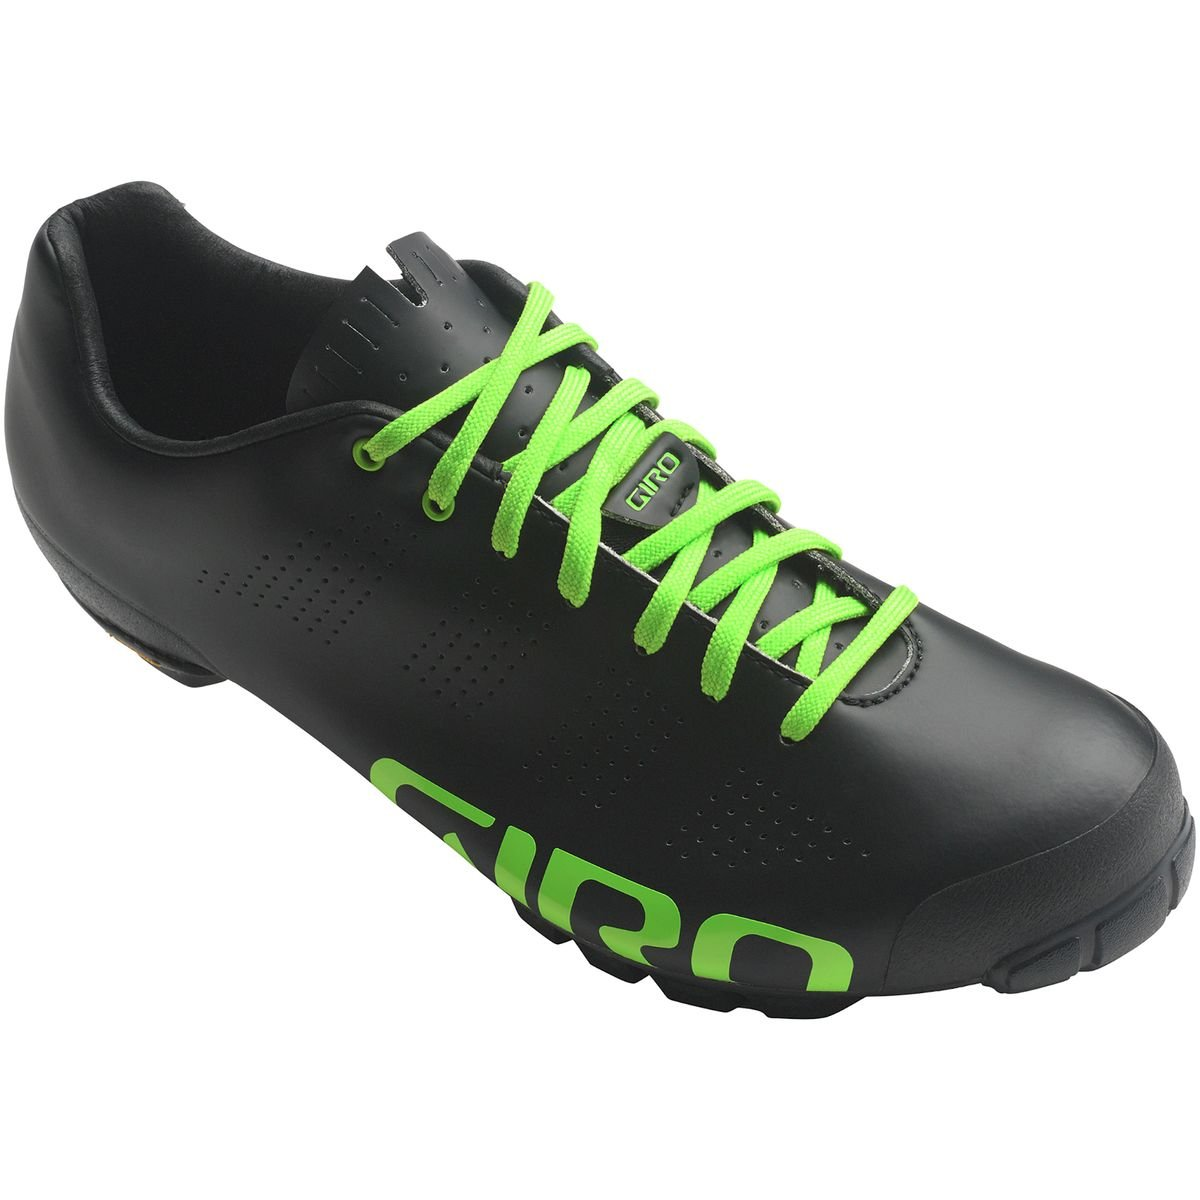 Giro Herren Empire Vr90 MTB Radsportschuhe Radsportschuhe Radsportschuhe - Mountainbike Mehrfarbig (schwarz Lime 000), 44.5 EU adfd10